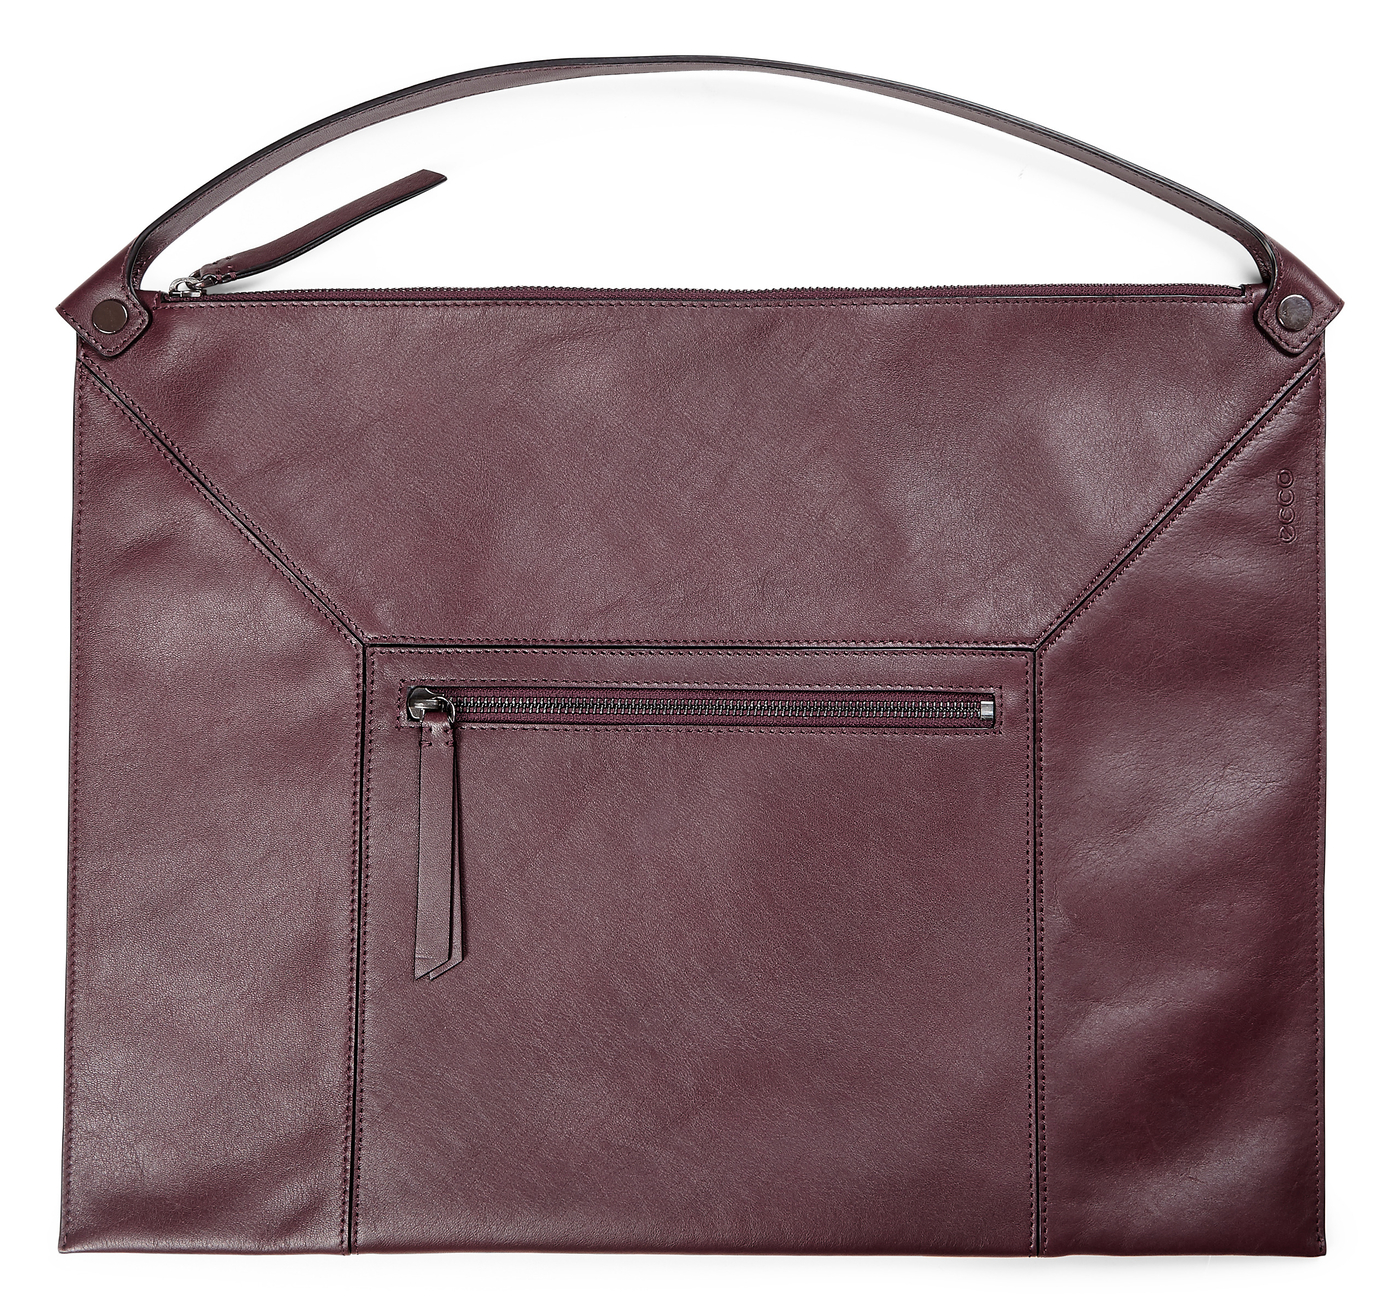 ECCO Sculptured Shoulder Bag 2